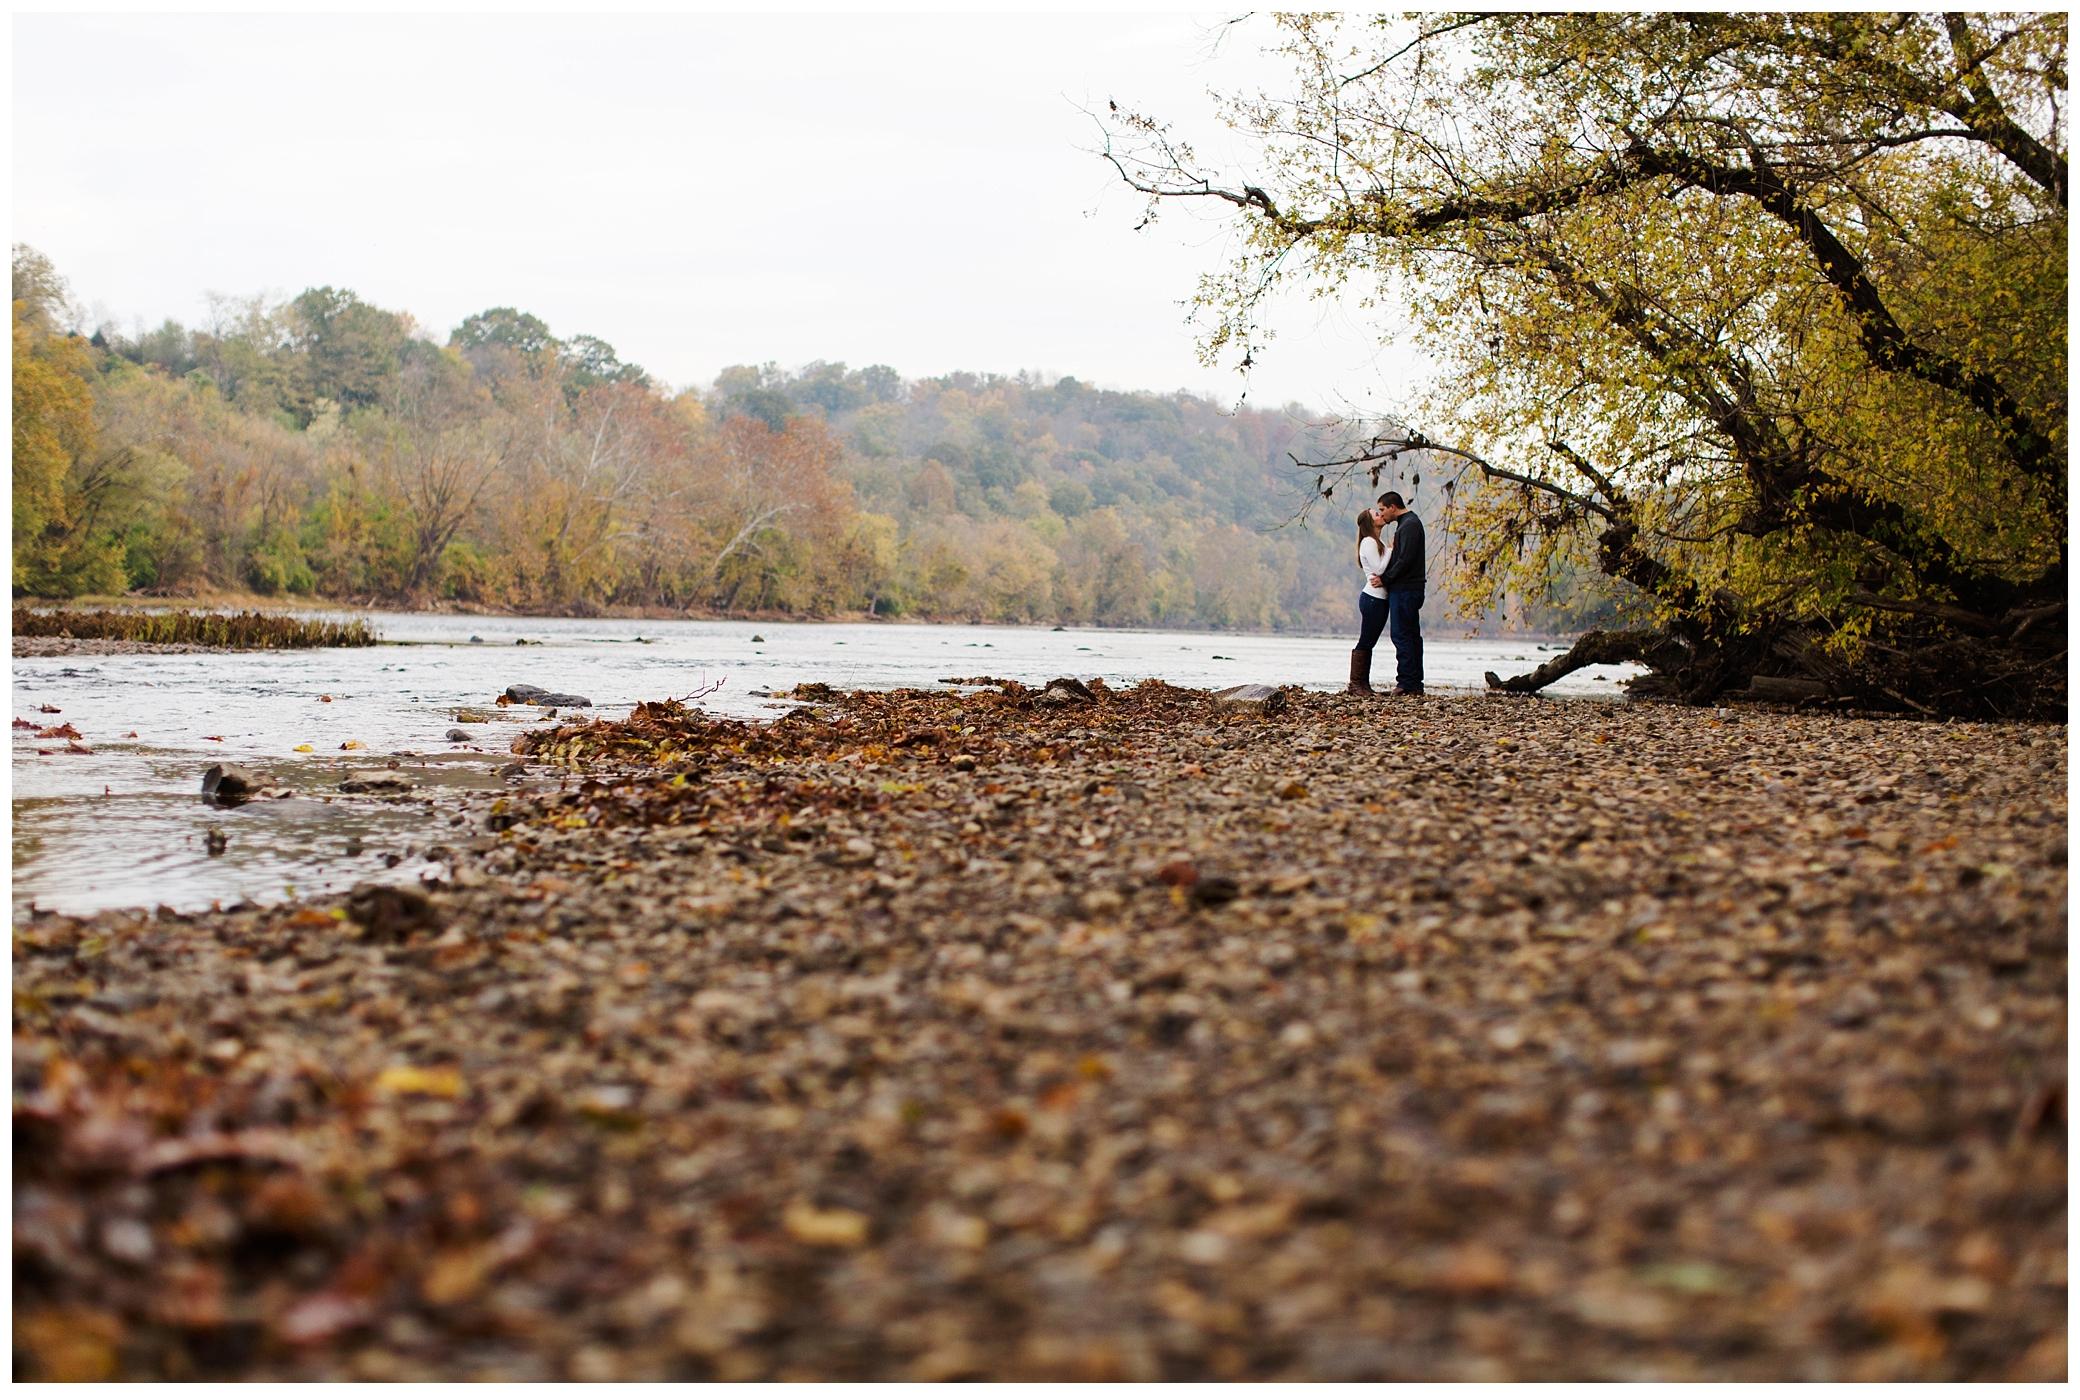 Skyryder Photography Blacksburg Virginia Photographer